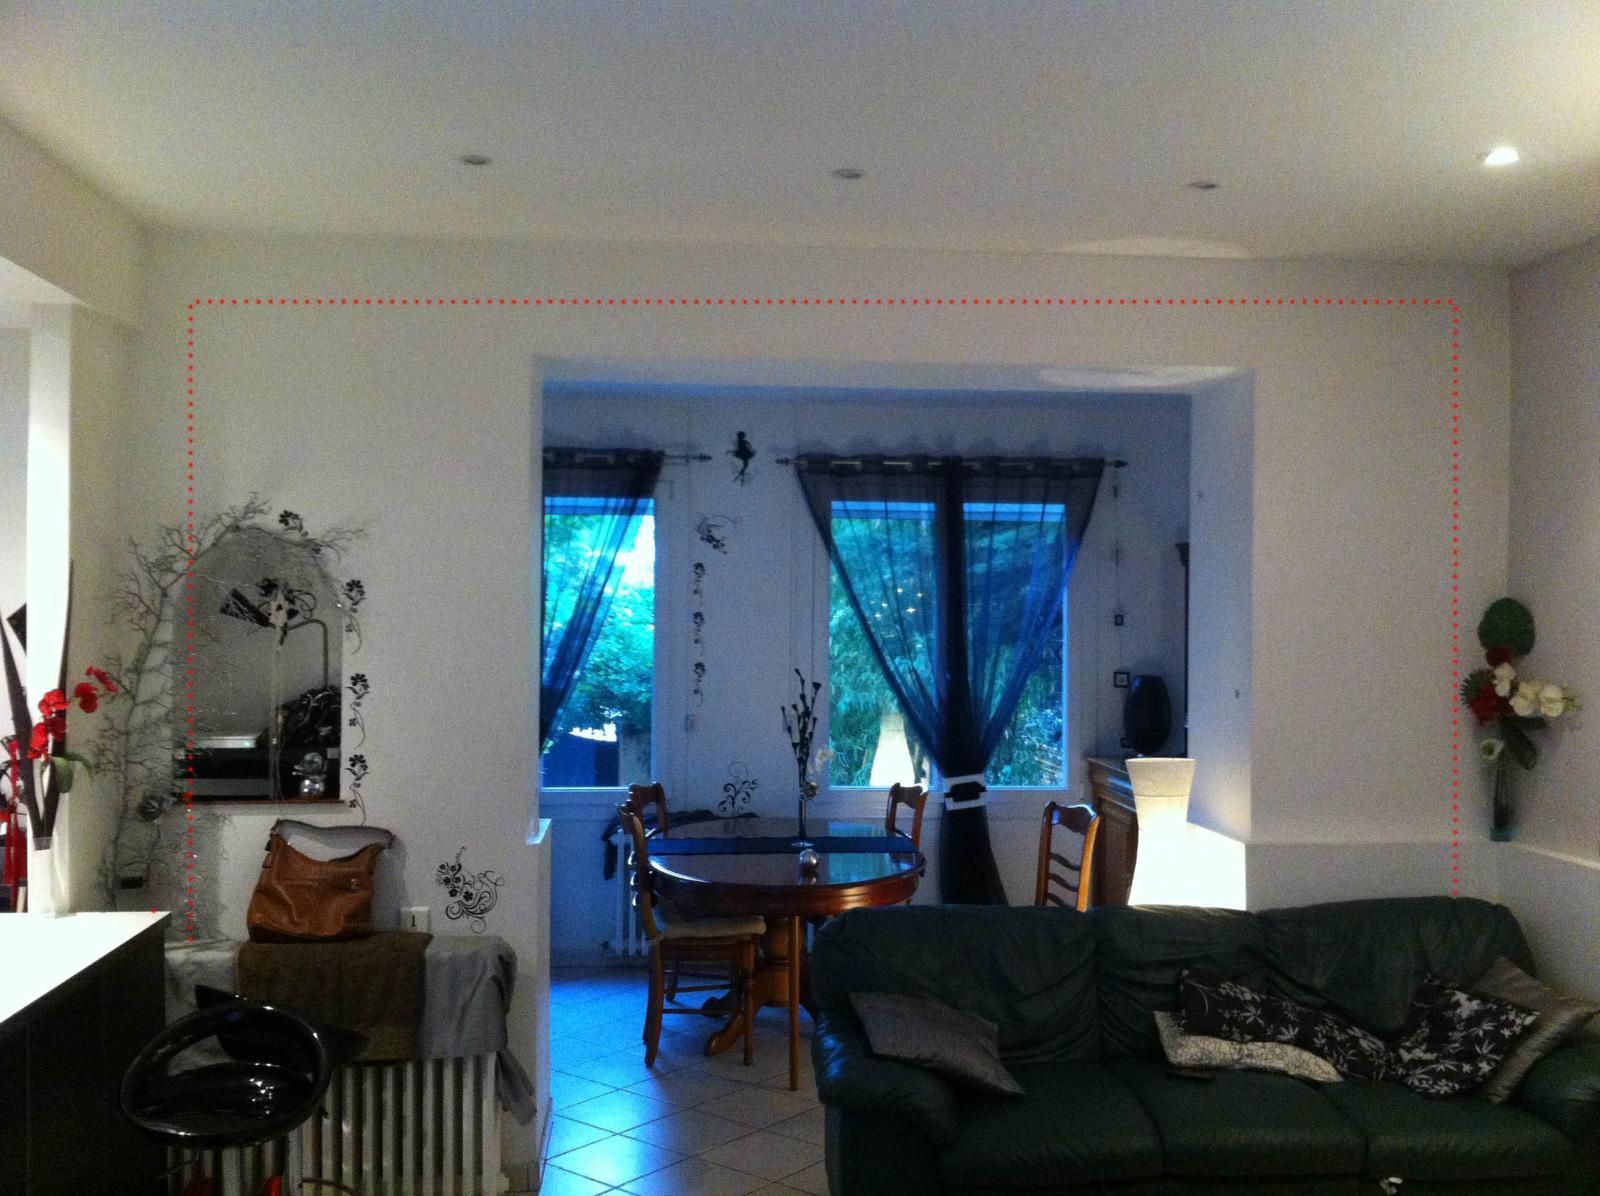 garantie d cennale ing nieur b ton obligatoire. Black Bedroom Furniture Sets. Home Design Ideas